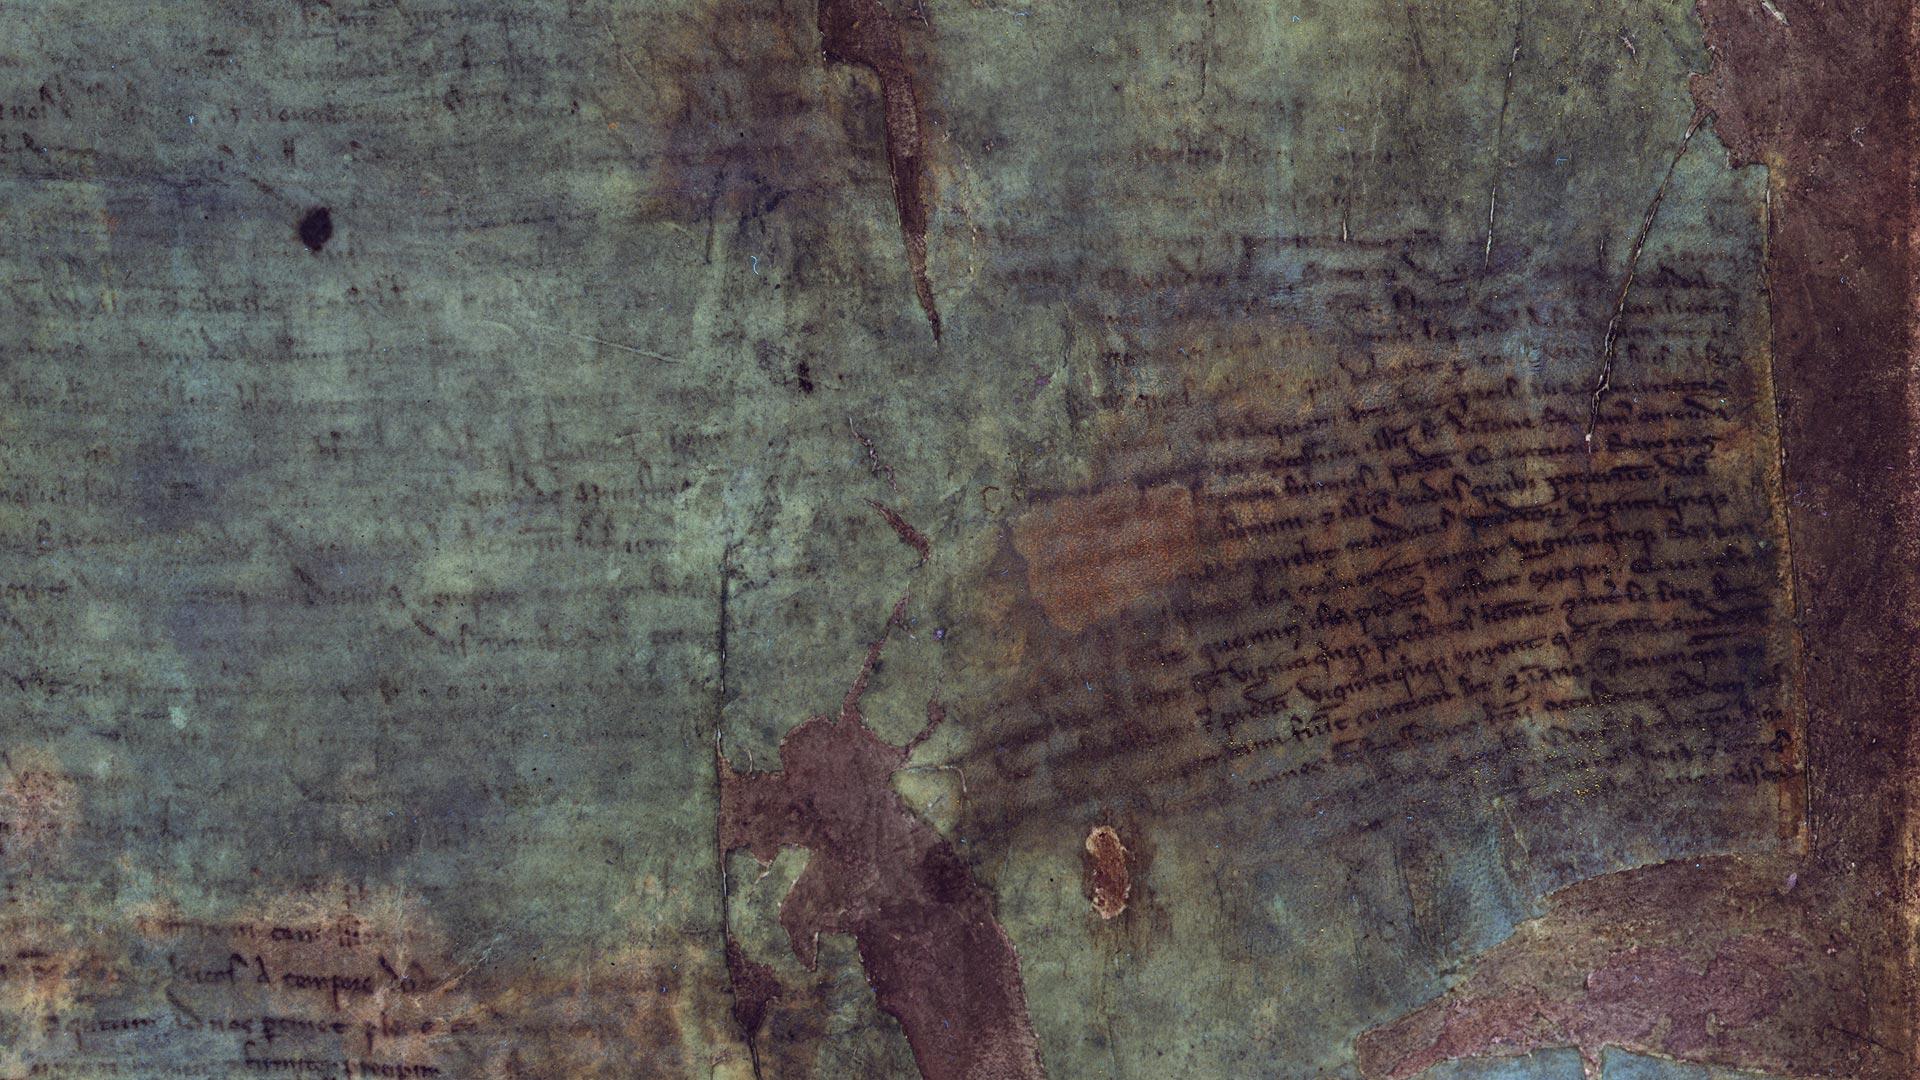 Multispectral imaging on the burnt Magna Carta